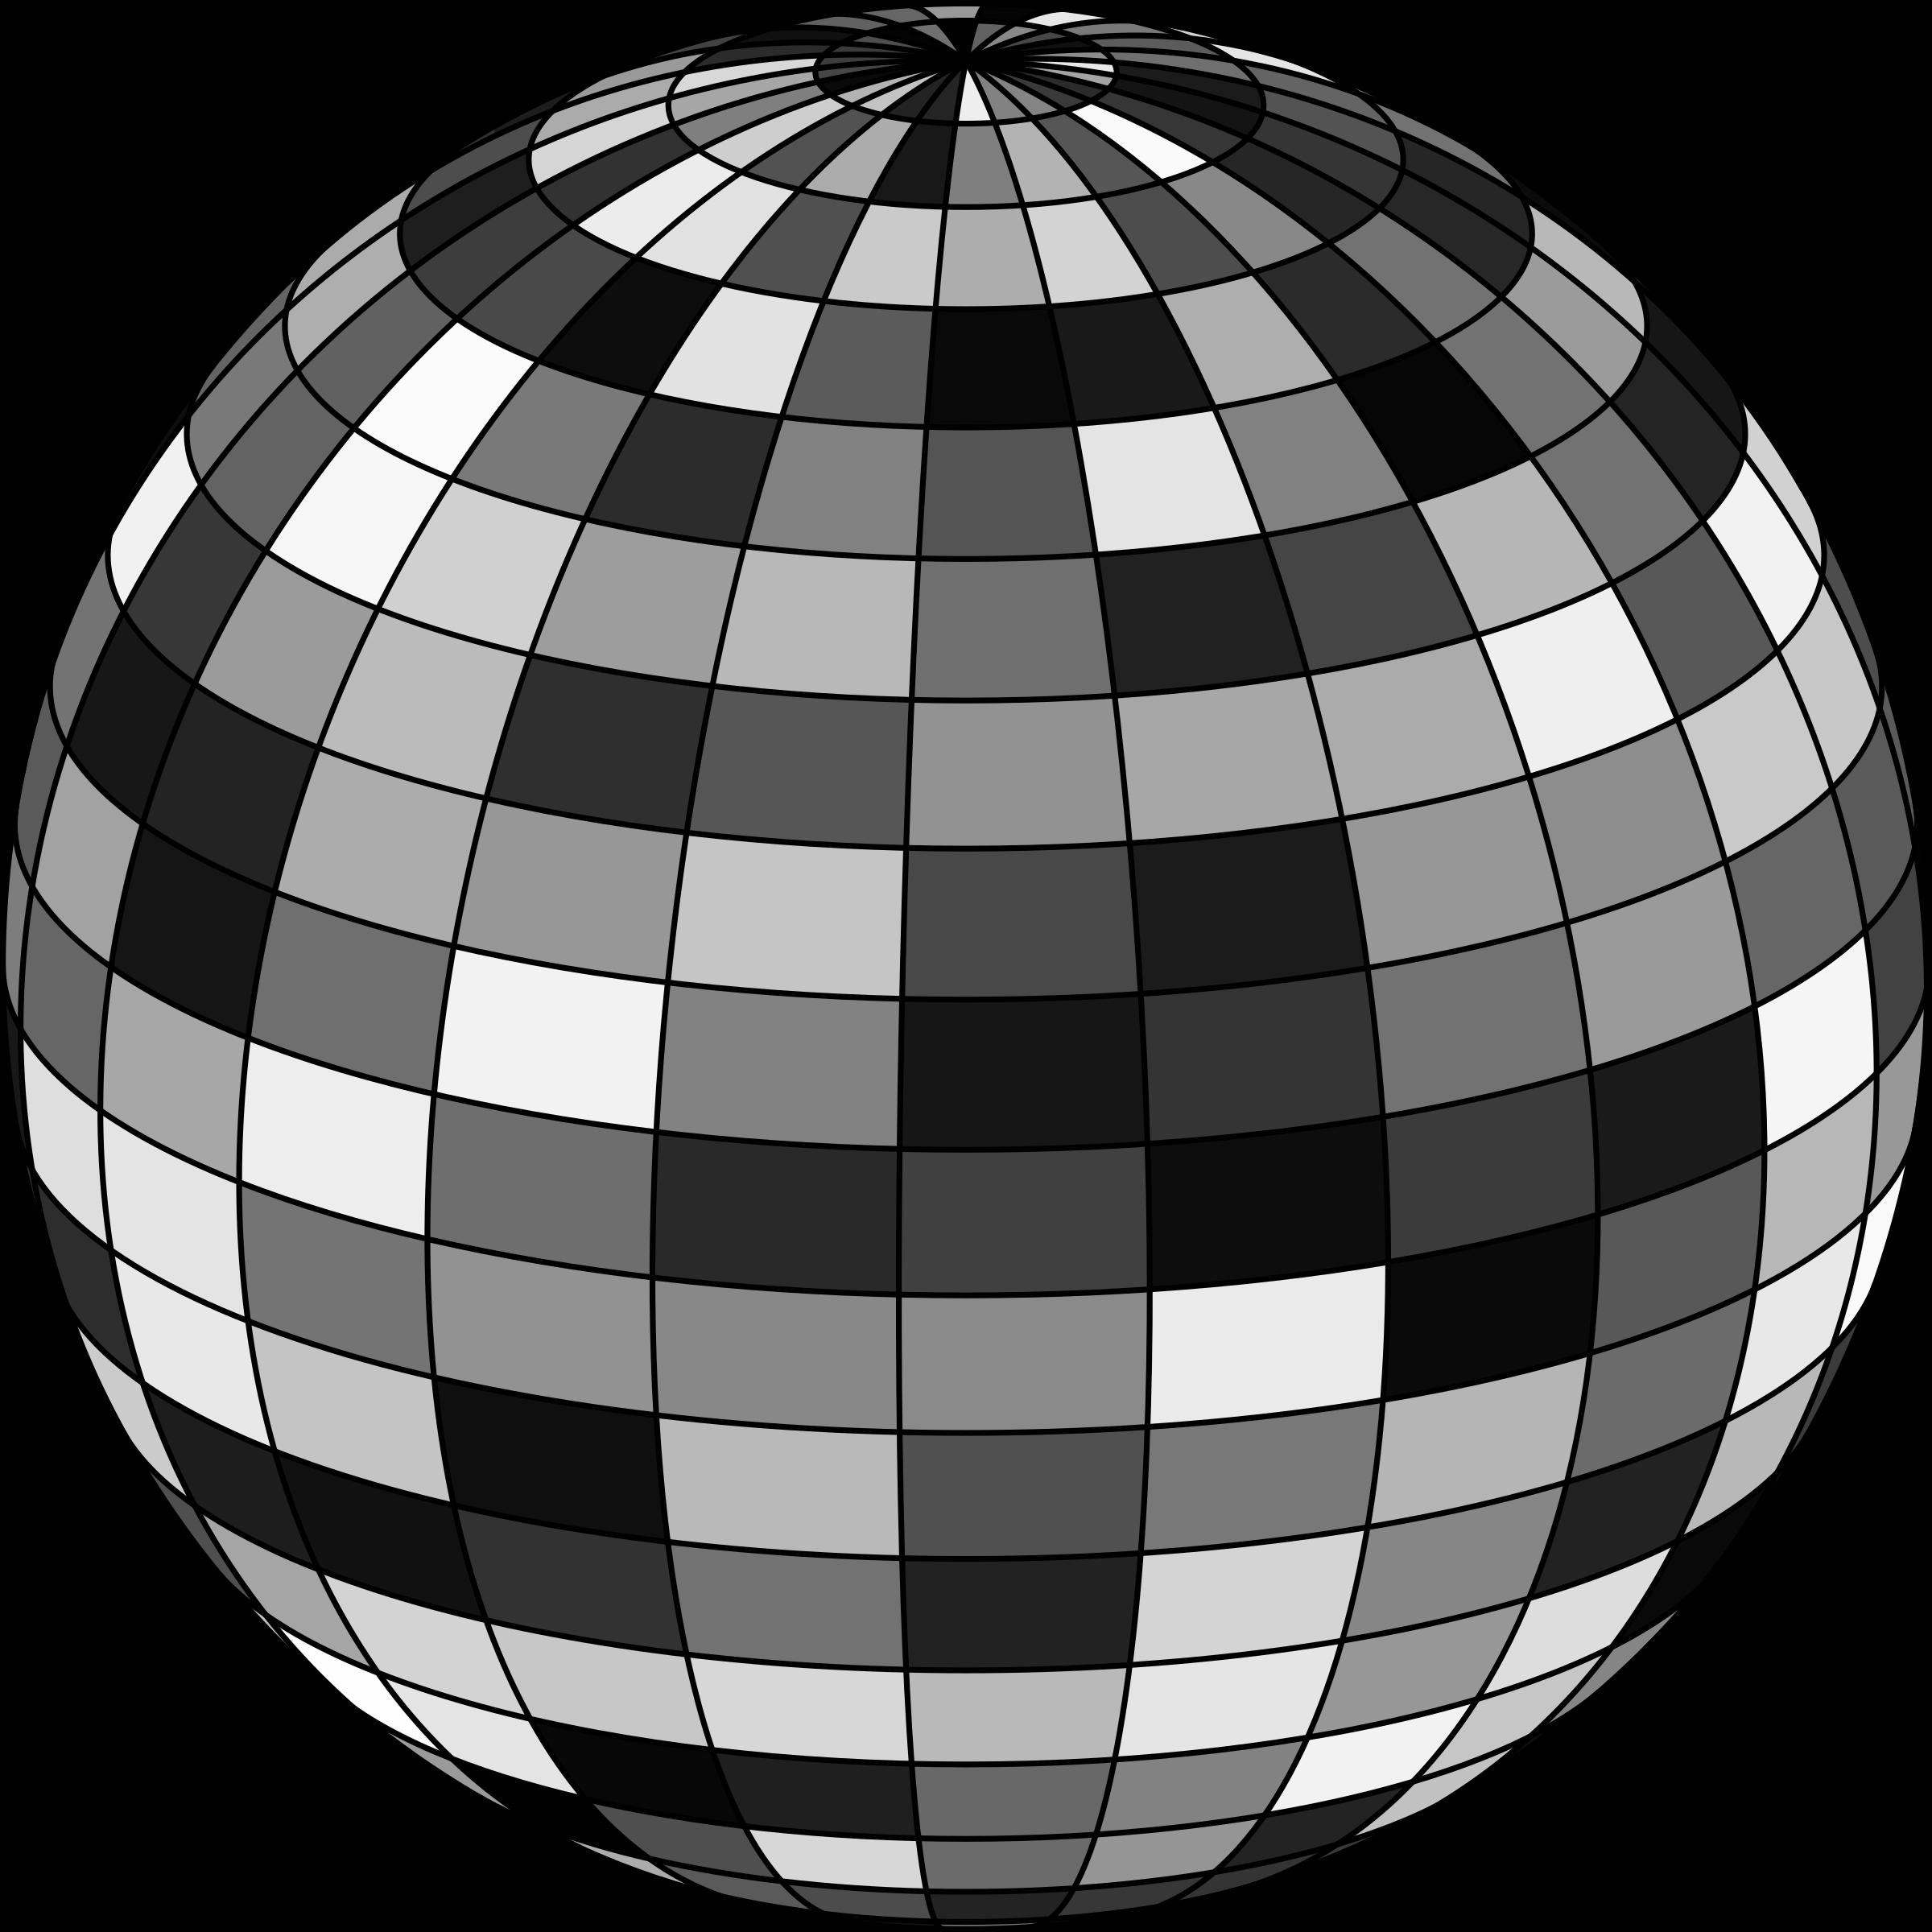 Clipart - Sphere 4